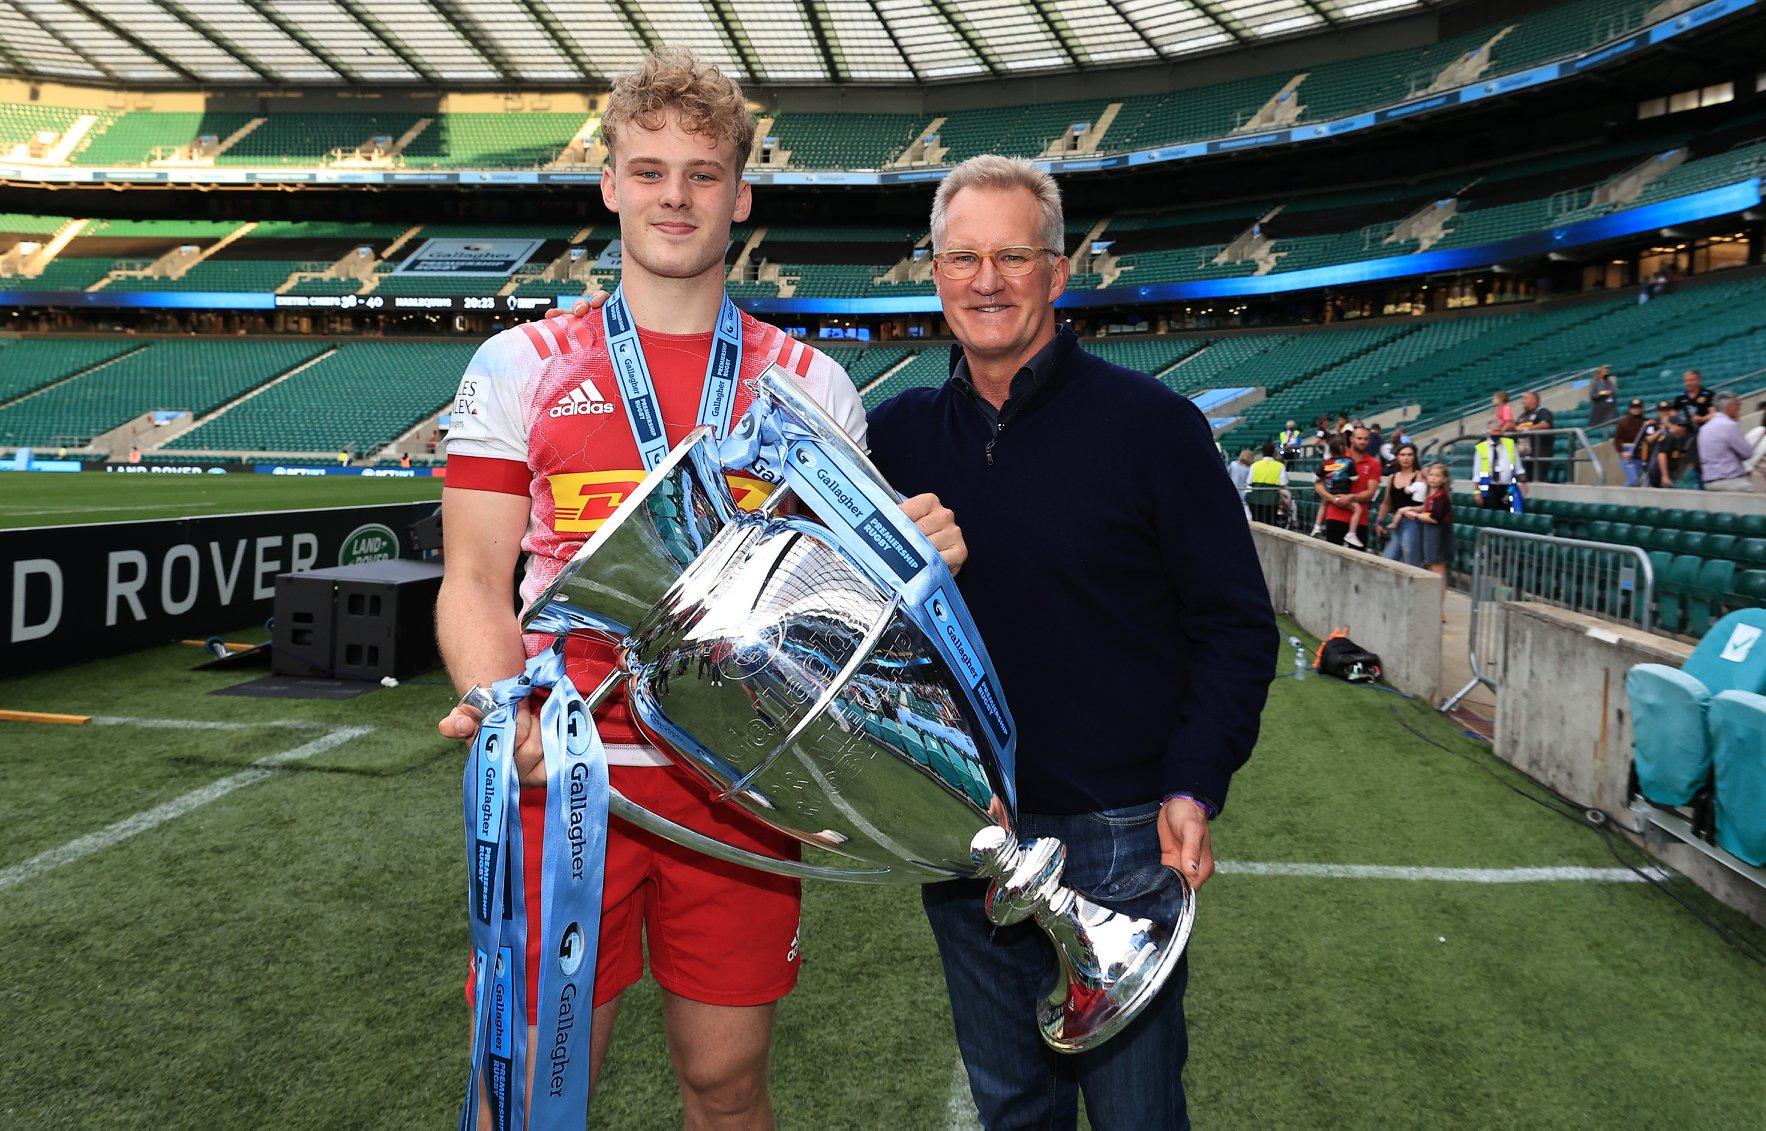 Video: Le due mete decisive di Louis Lynagh, nella finale di Premiership (ph. Harlequins Rugby Union)